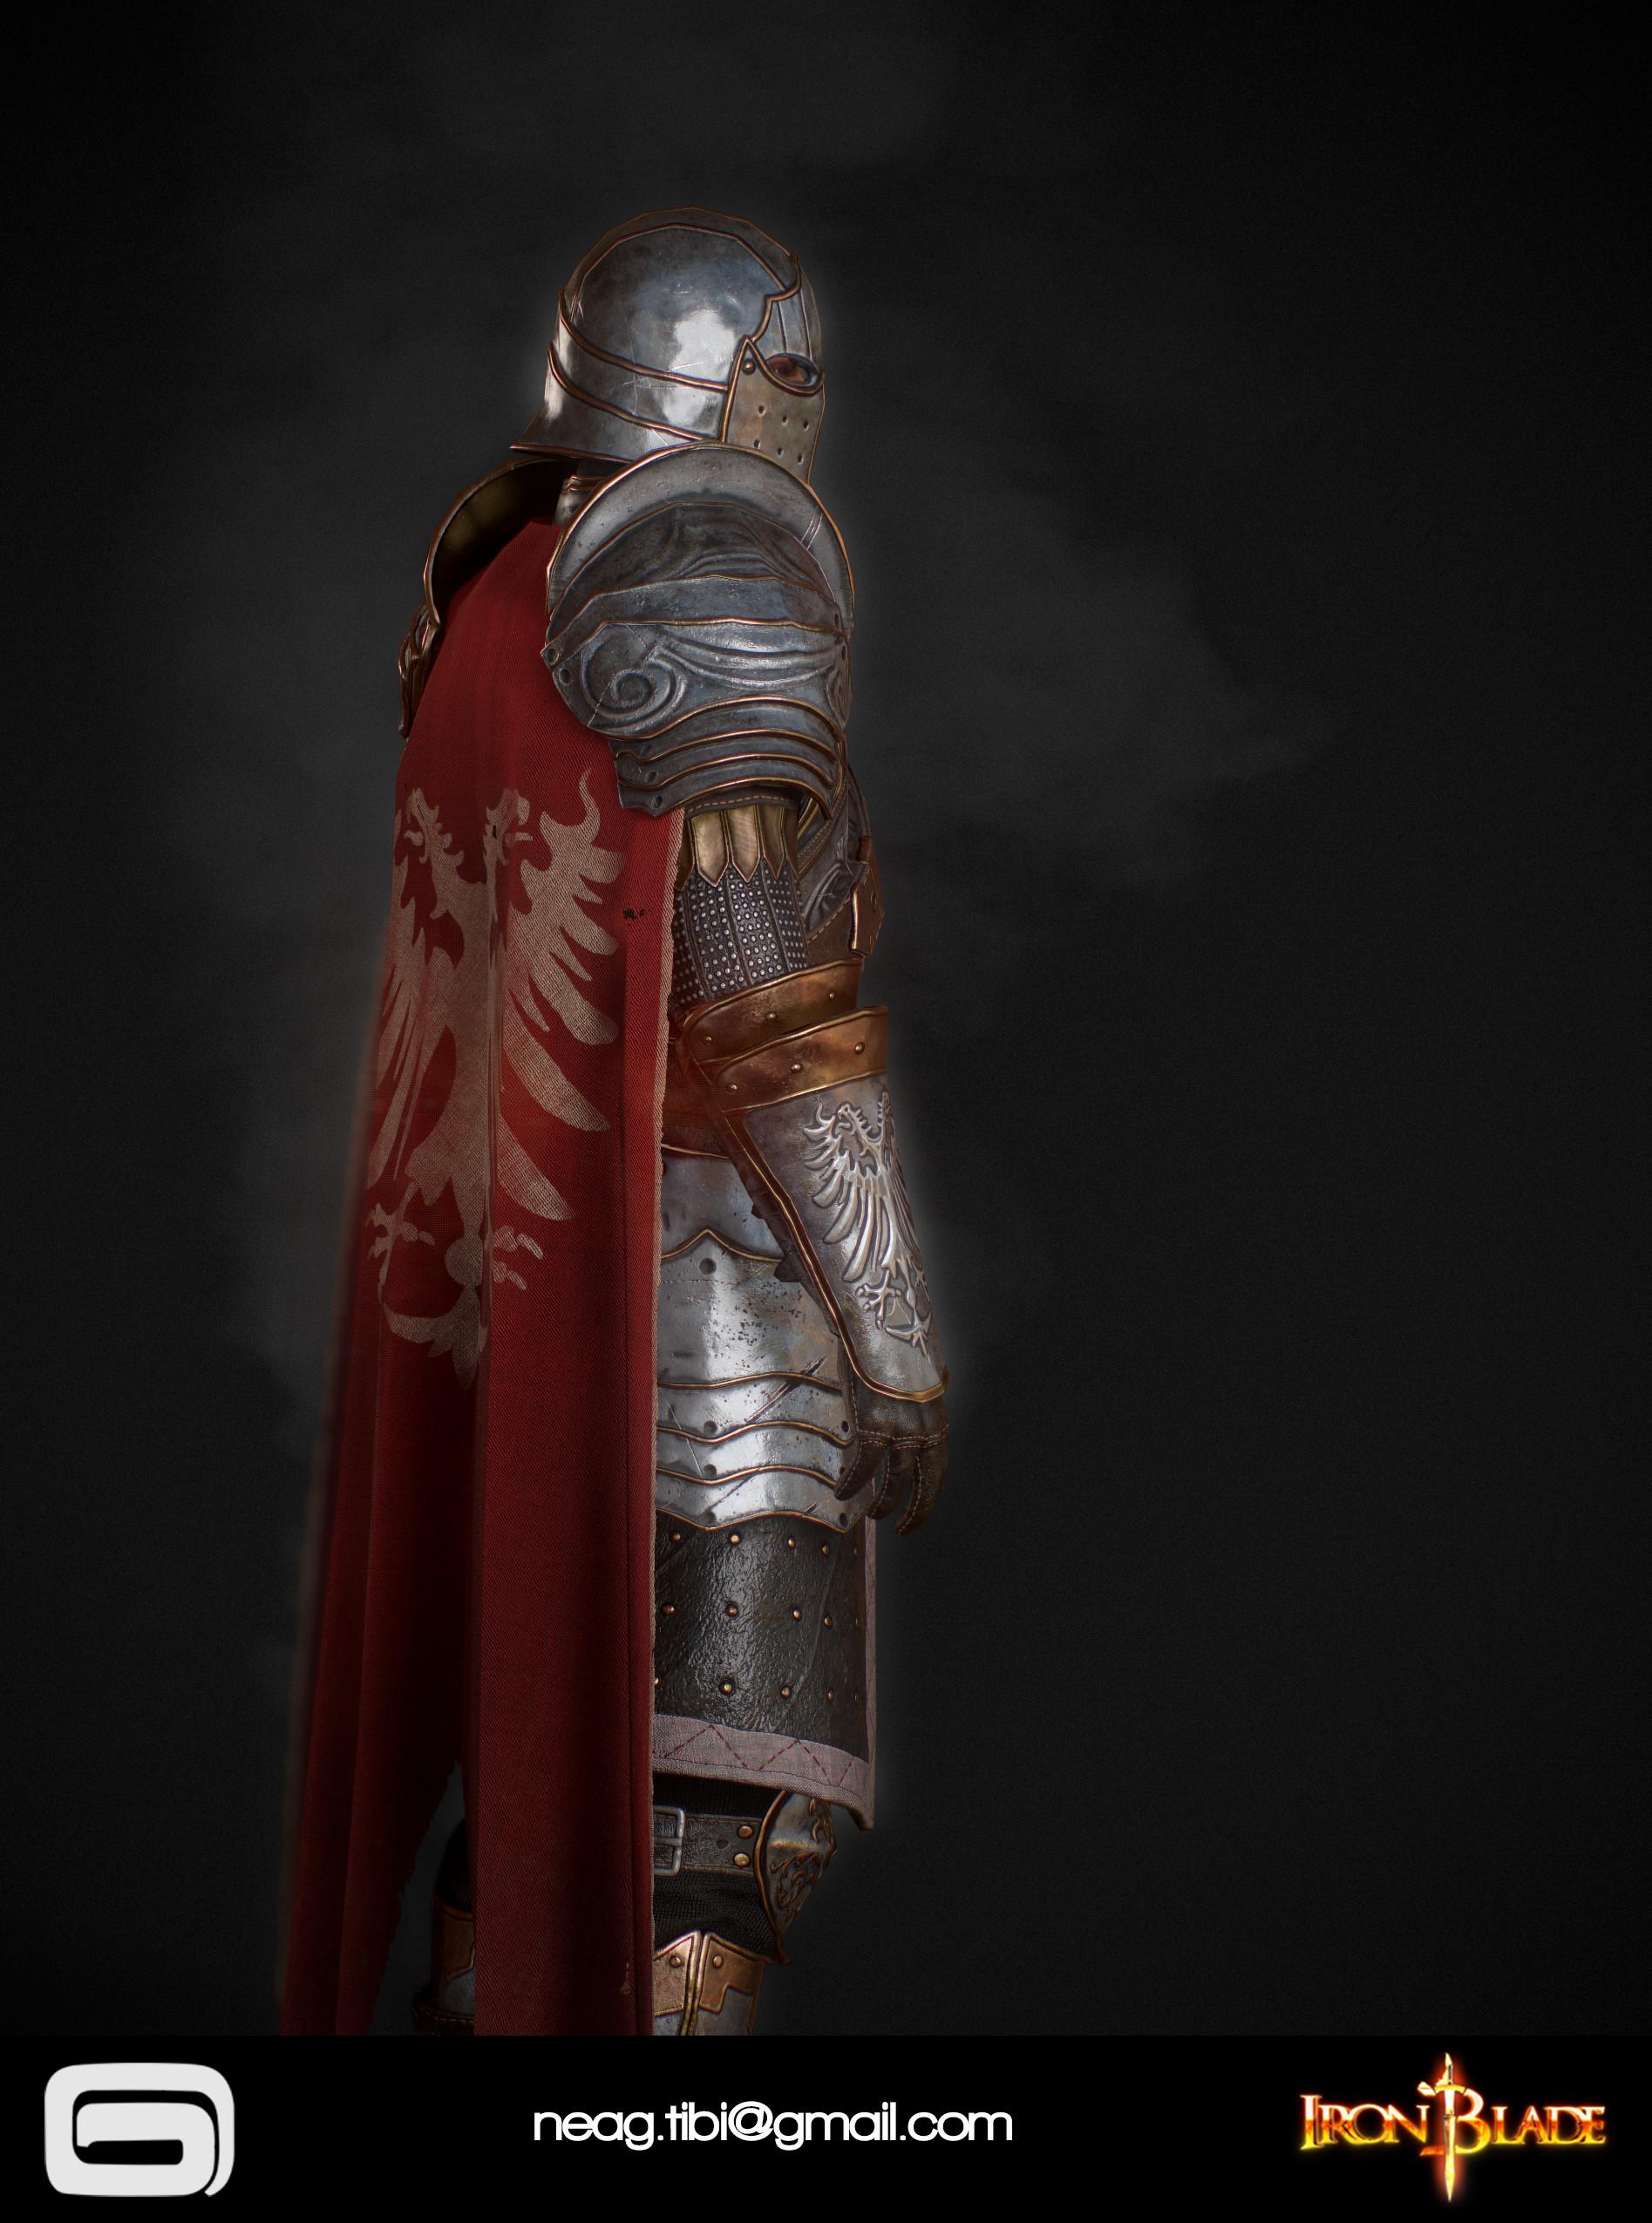 Tibi neag tibi neag iron blade mc armor 02c low poly 07